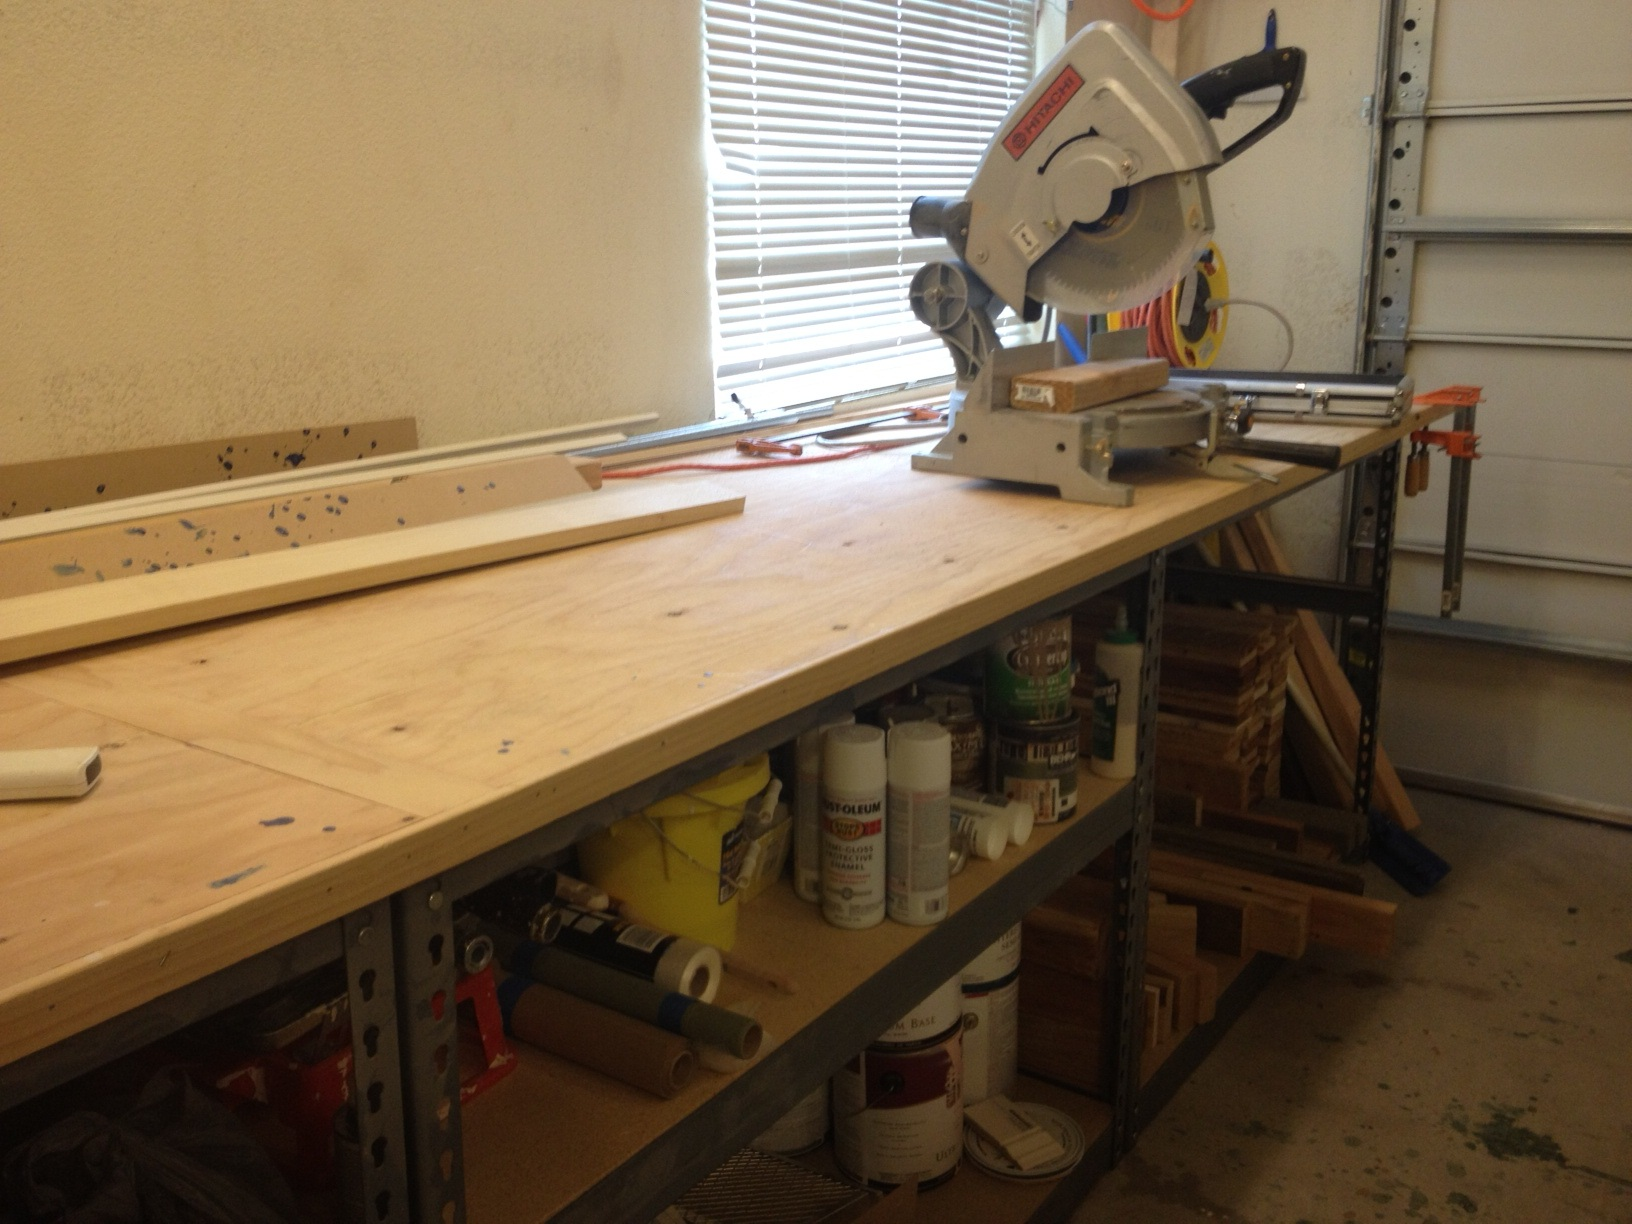 Workbench | DIY Project Blog